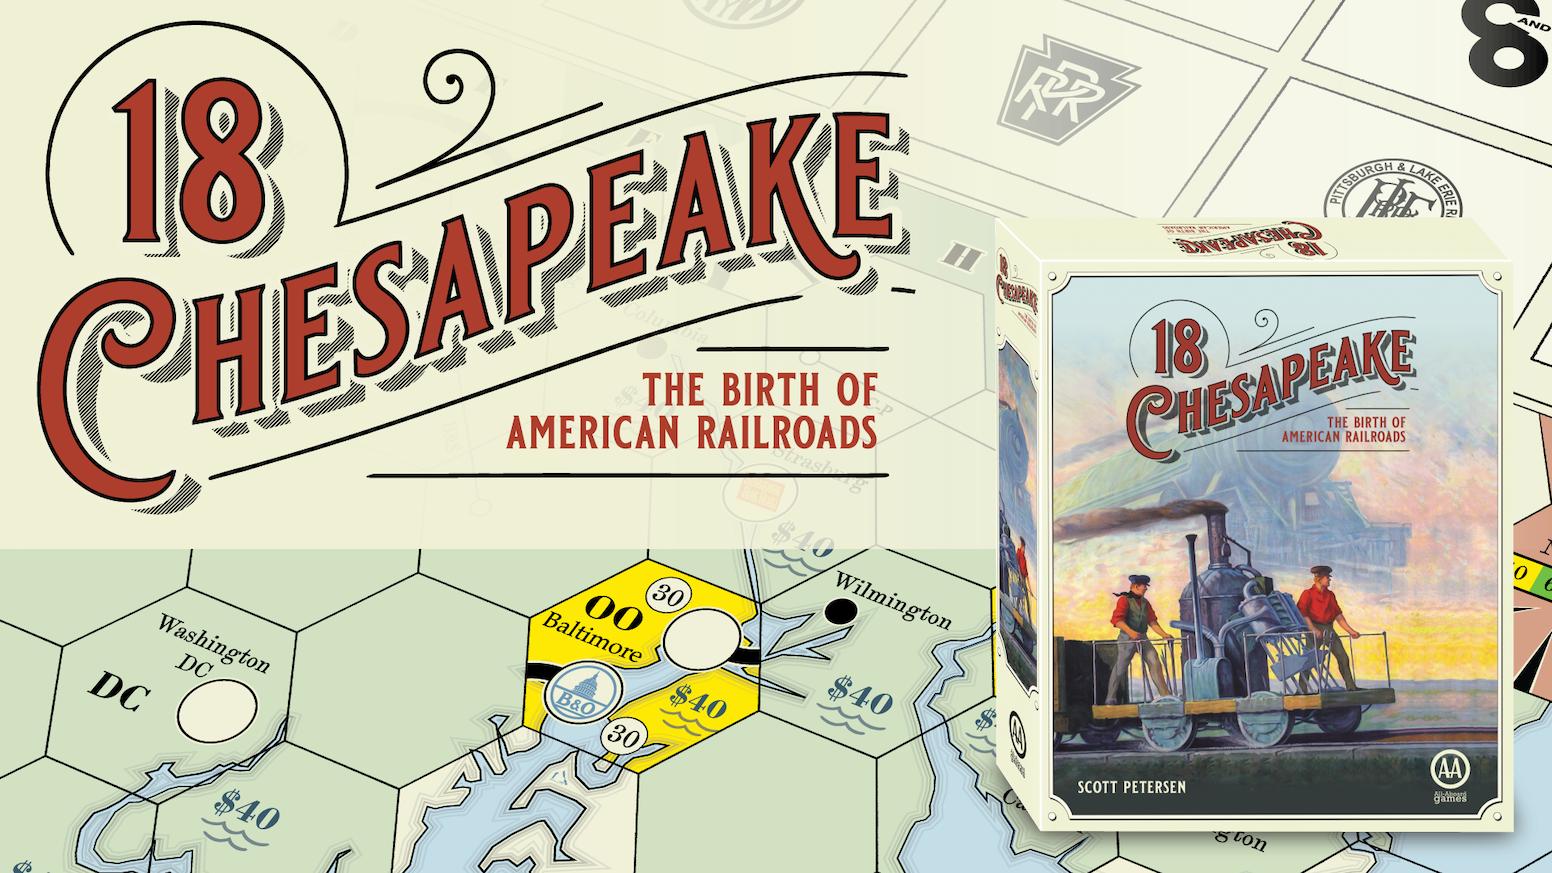 18Chesapeake - The Birth of American Railroads - Introductory 18xx Board Game